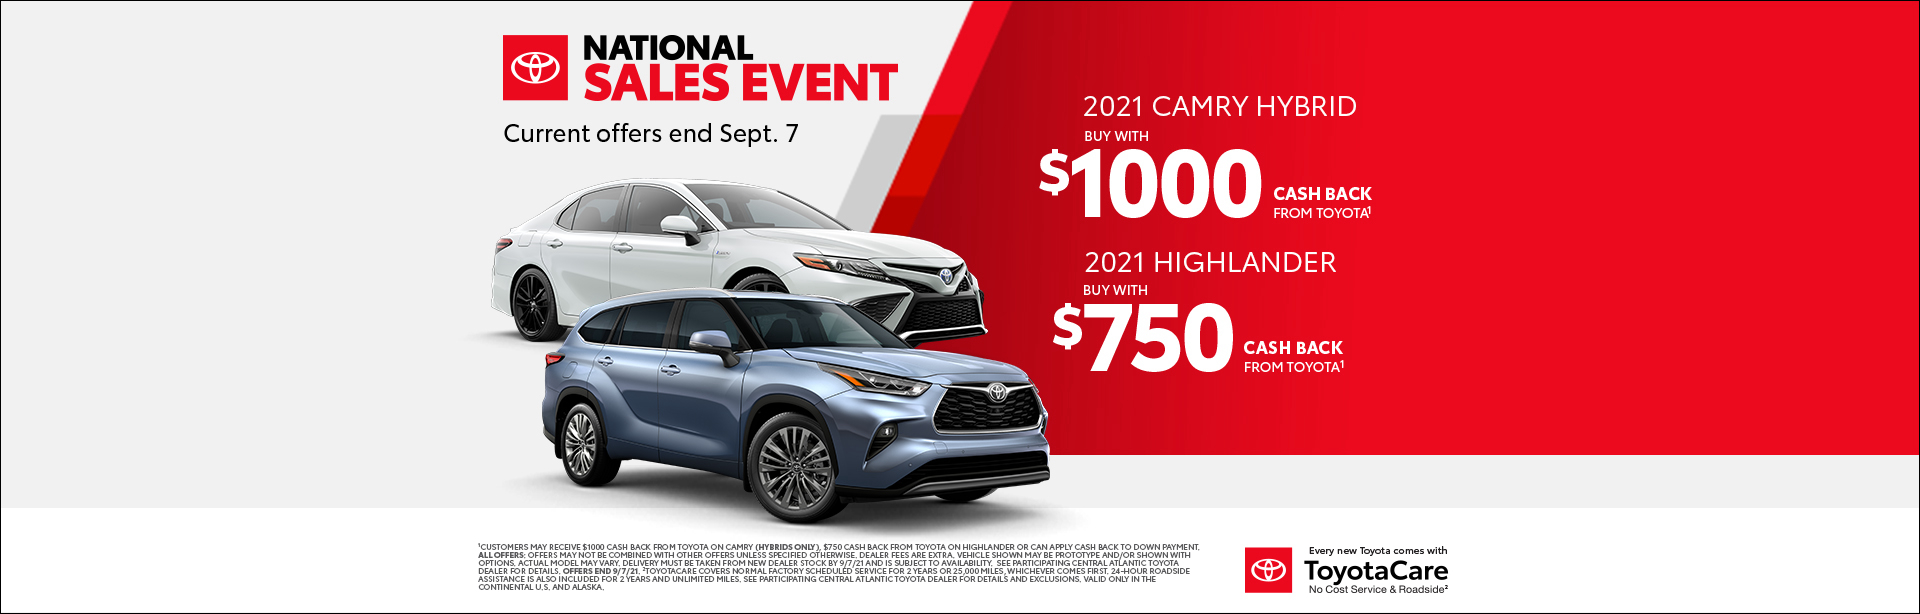 08-21_01_Central-Atlantic-Toyota-August-2021-CAT-National-Sales-Event-Camry-Highlander-_1920x614_1bd6_Camry-Hybrid-Highlander_R_xta.jpeg